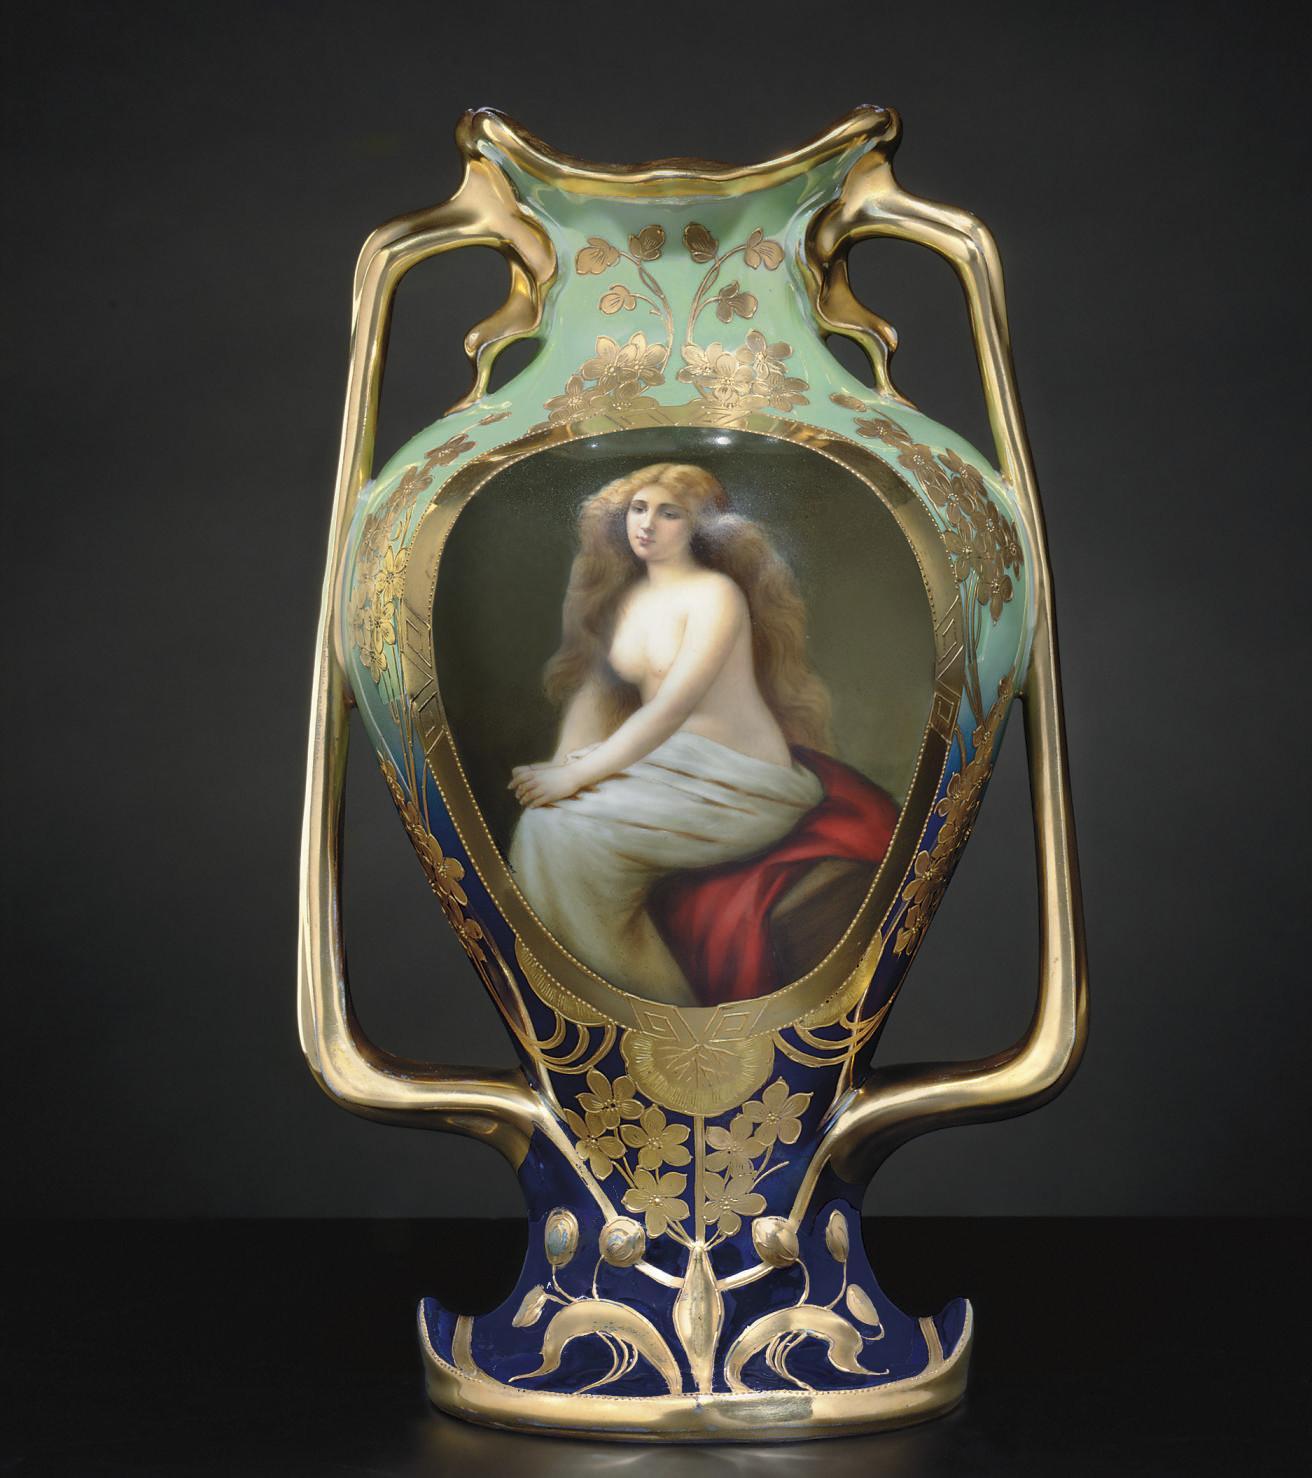 A VIENNA STYLE IRIDESCENT CELADON AND COBALT-BLUE GROUND PORTRAIT VASE, 'SOLITUDE'